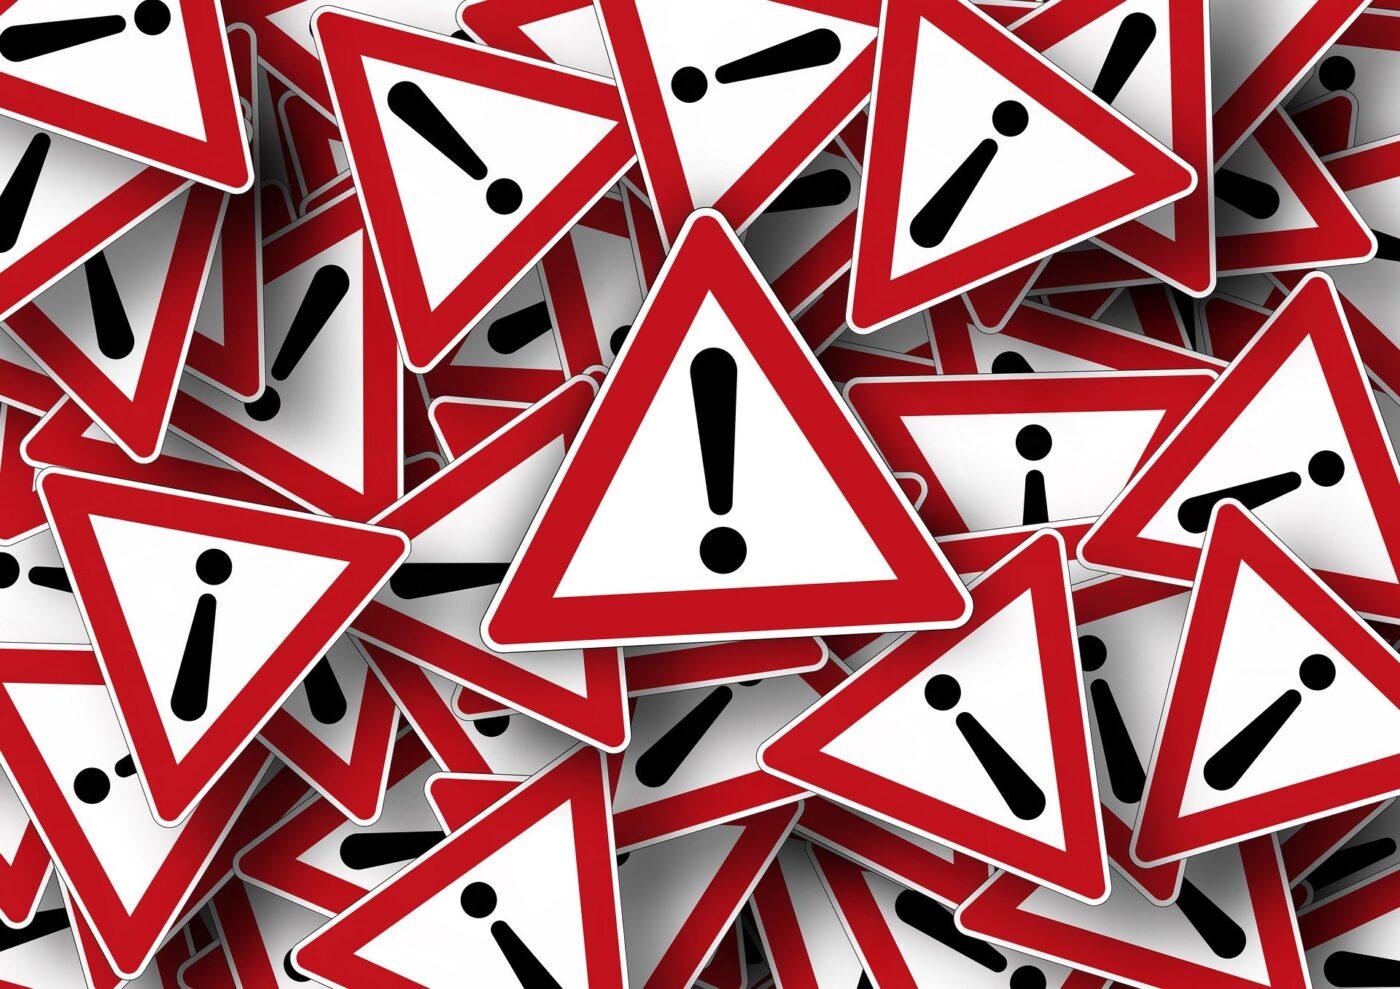 Issue Management mit Social Media Monitoring